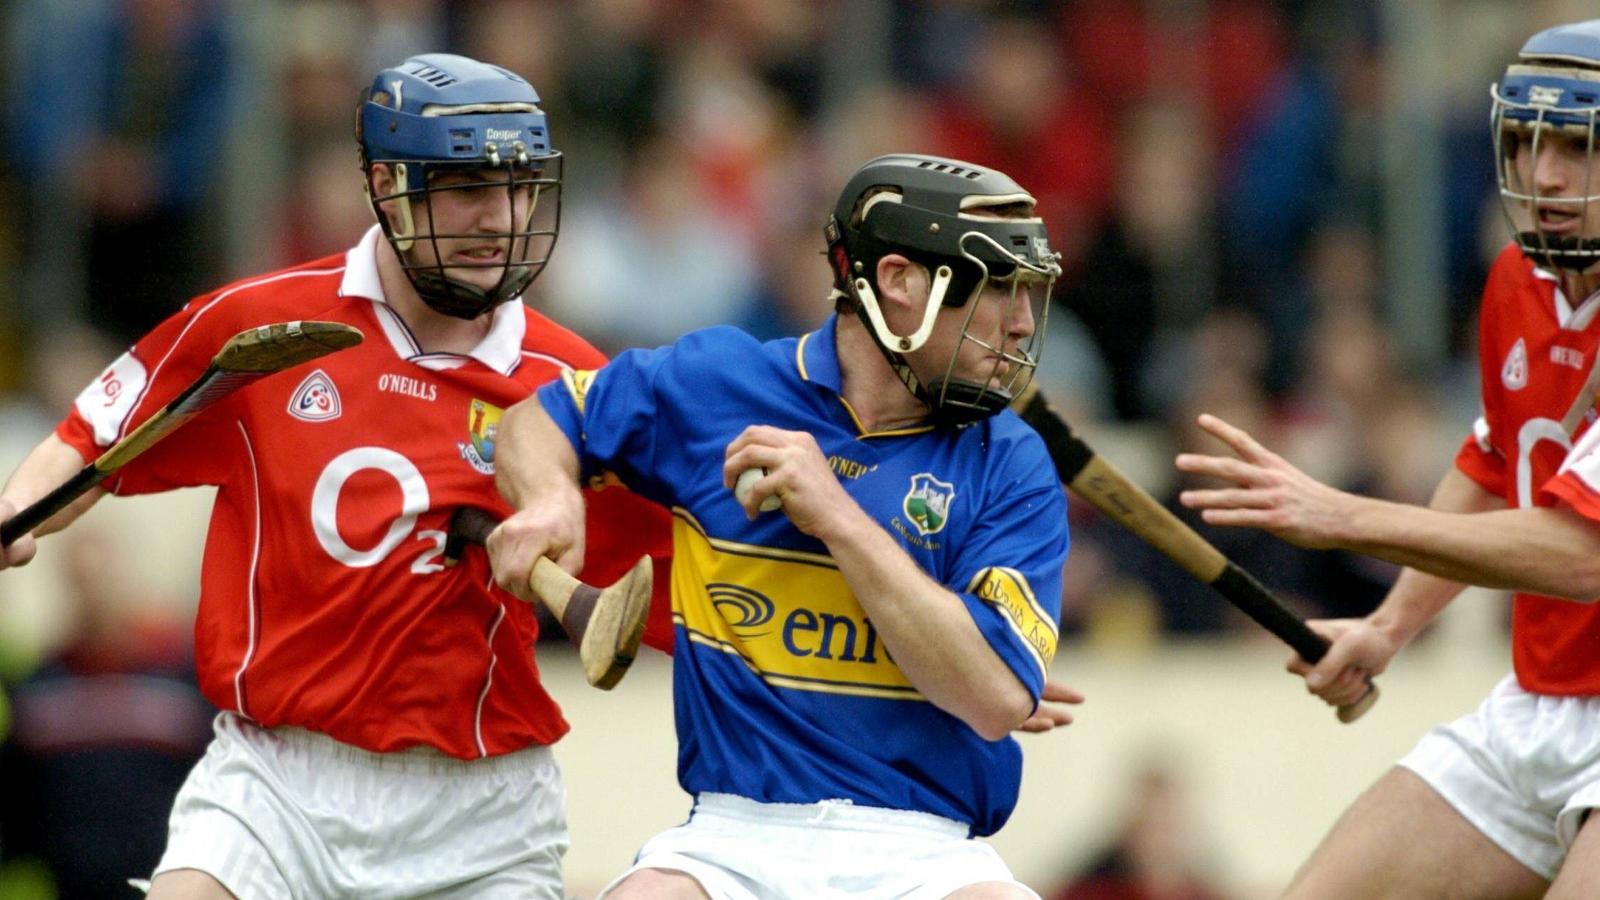 Image - Byrne in Tipp colours against Cork